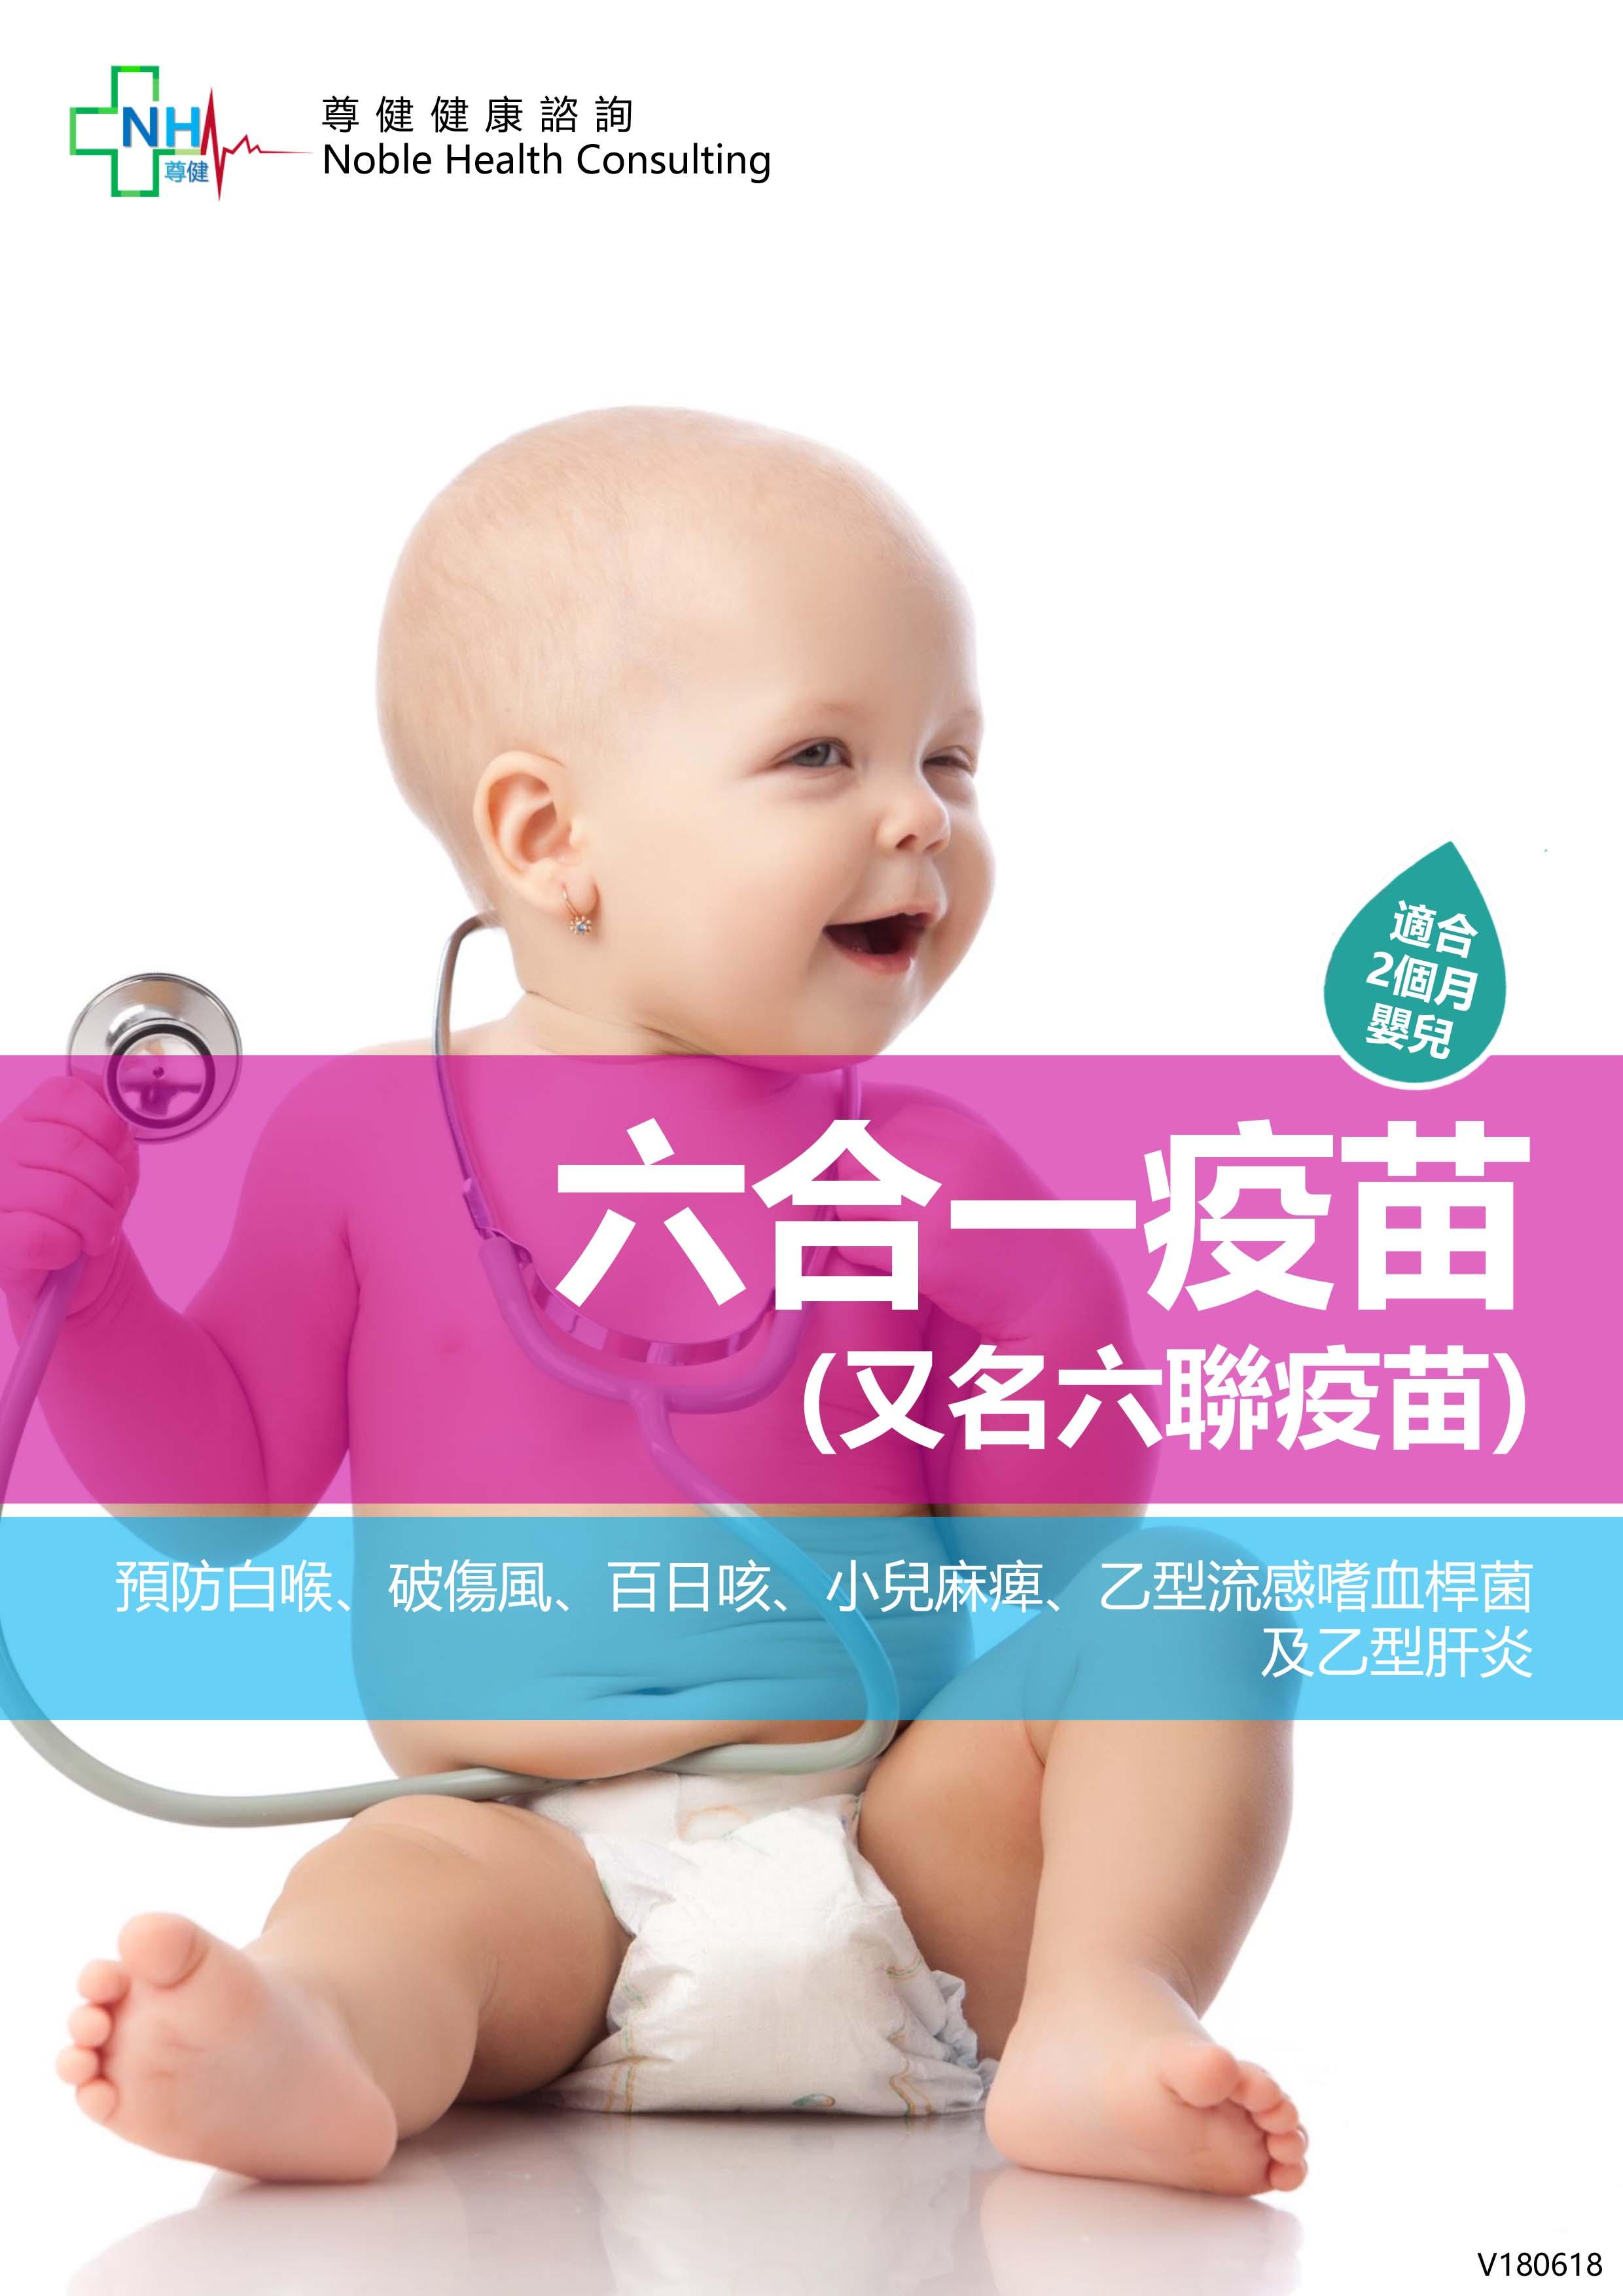 3h-baby-6-in-1-vaccine-1.jpg